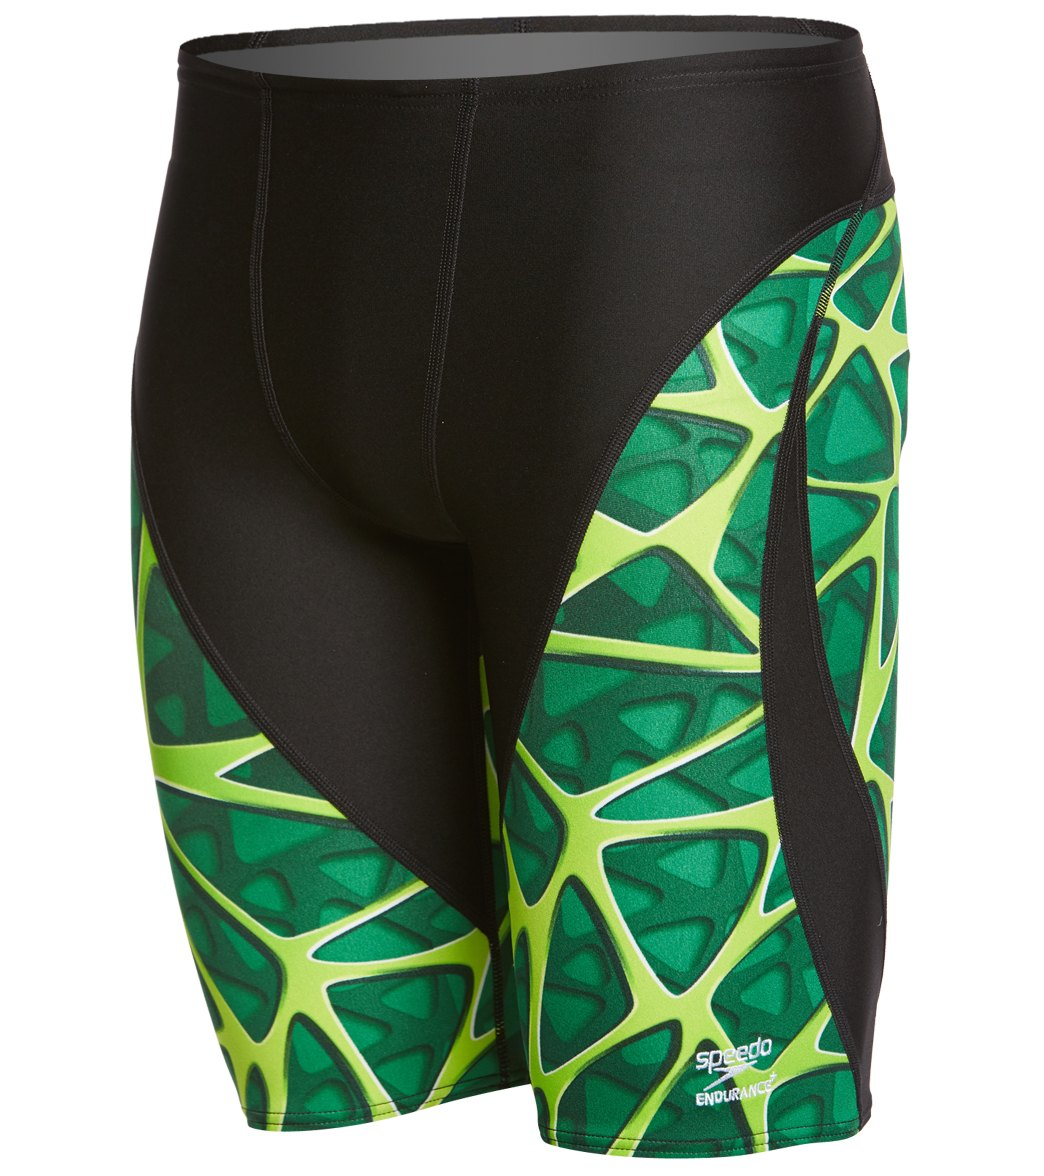 Swimsuit Speedo Men/'s and Women/'s Swimwear 7705800-P Speedo Mens Caged Out Jammer Endurance